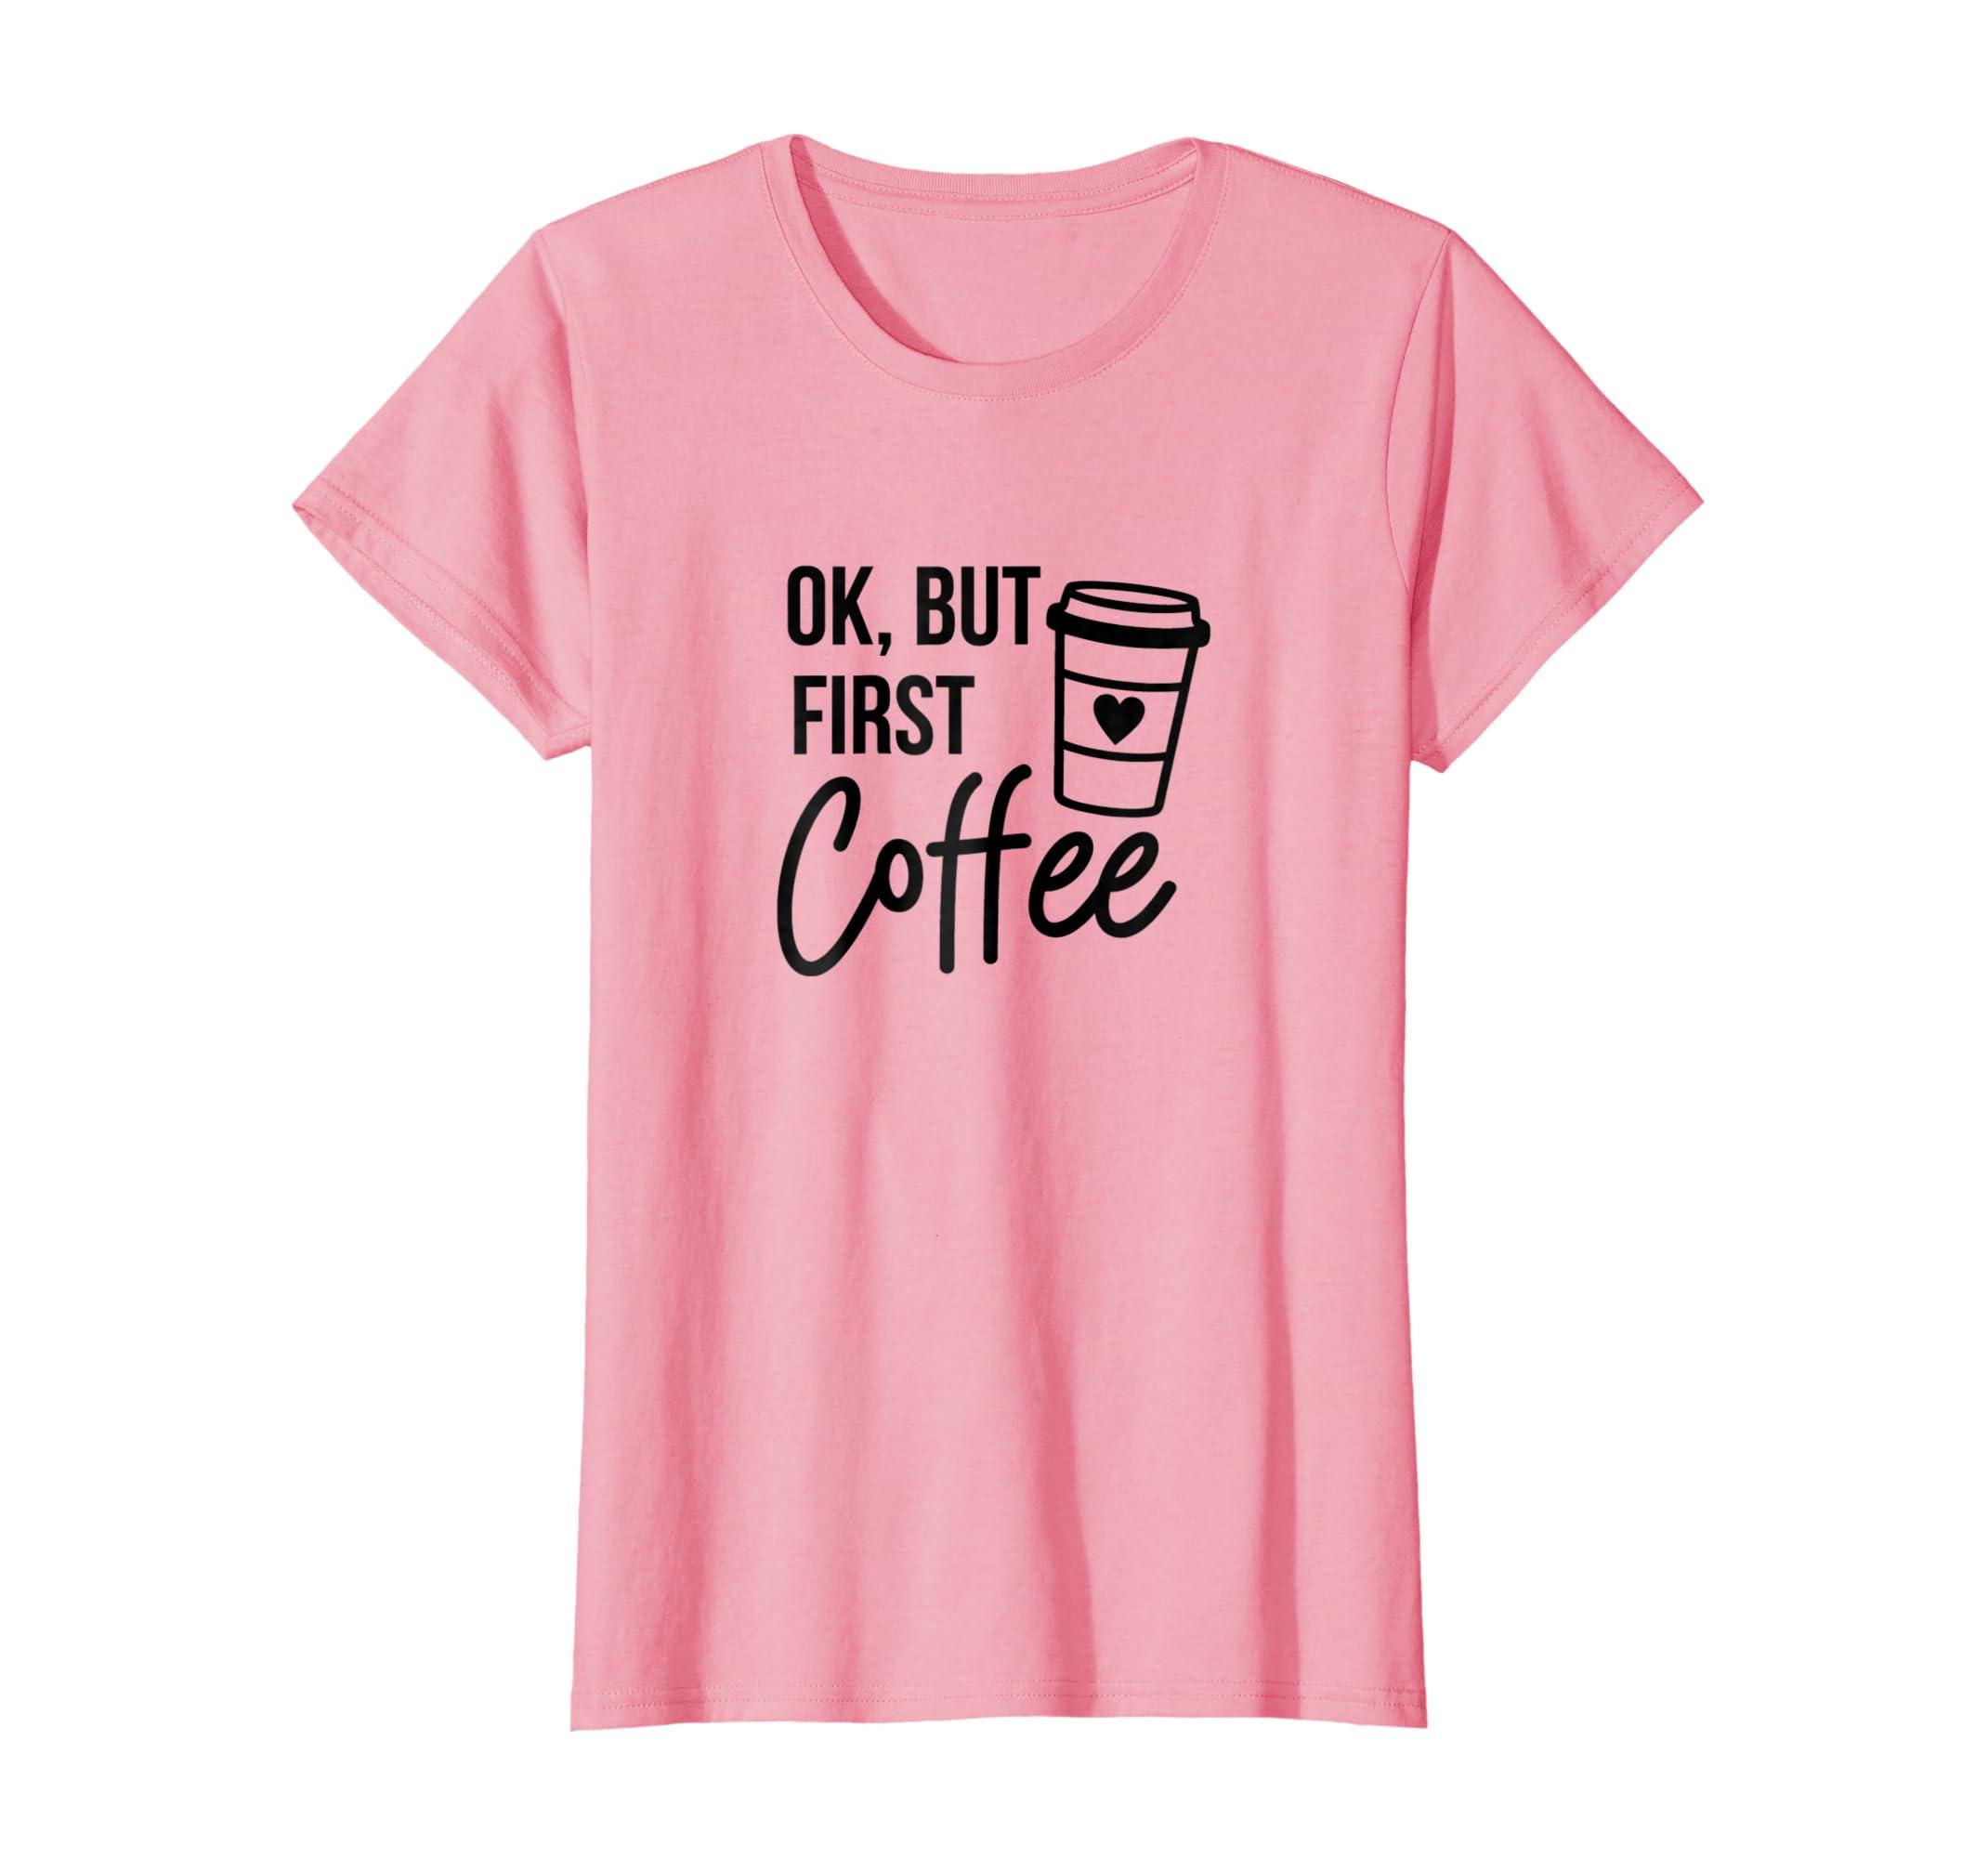 Womens Ok, But First Coffee Shirt for Women Coffee Lovers Tee-Teesml